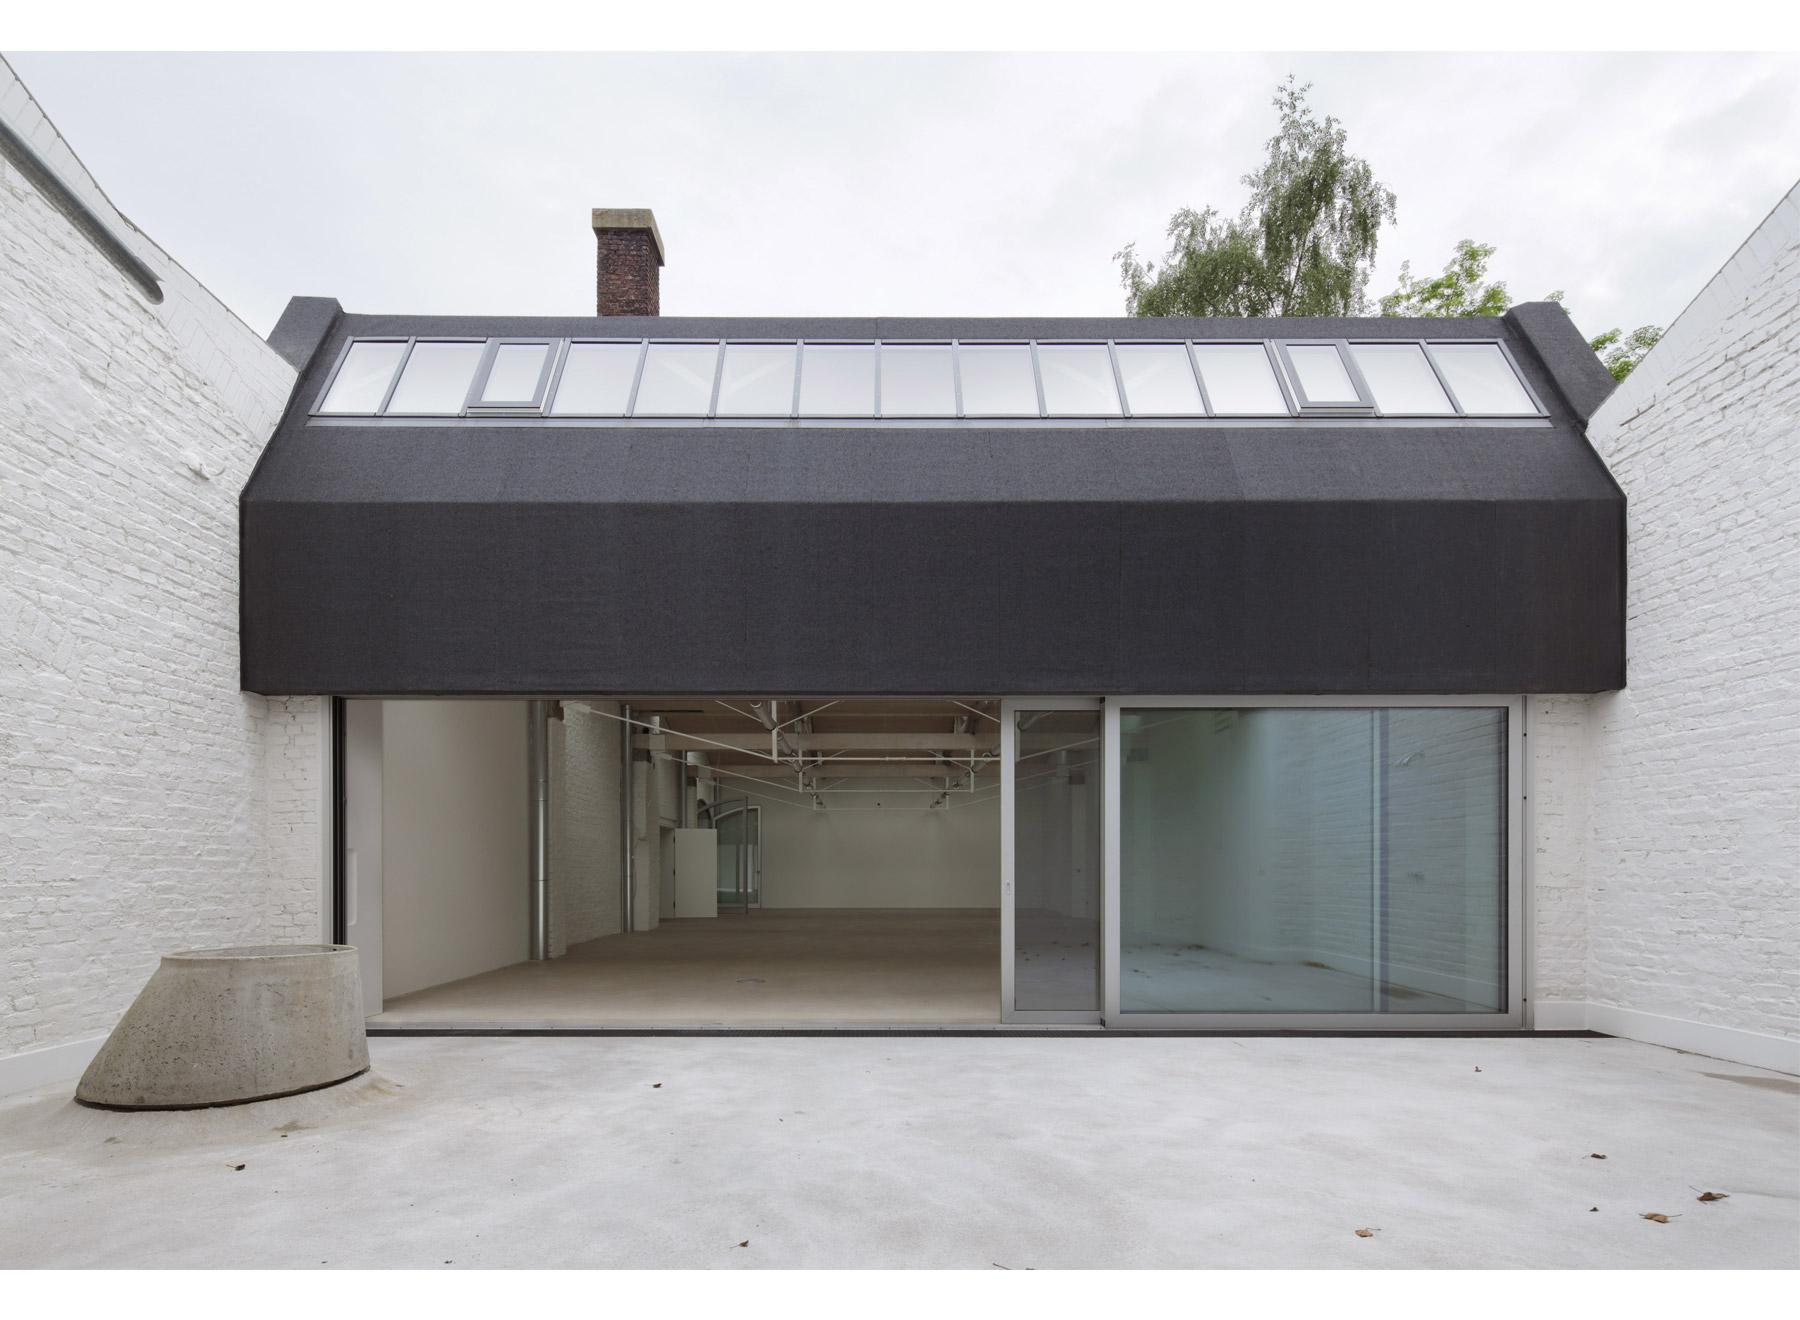 new patio, photo: Jan Rothstein